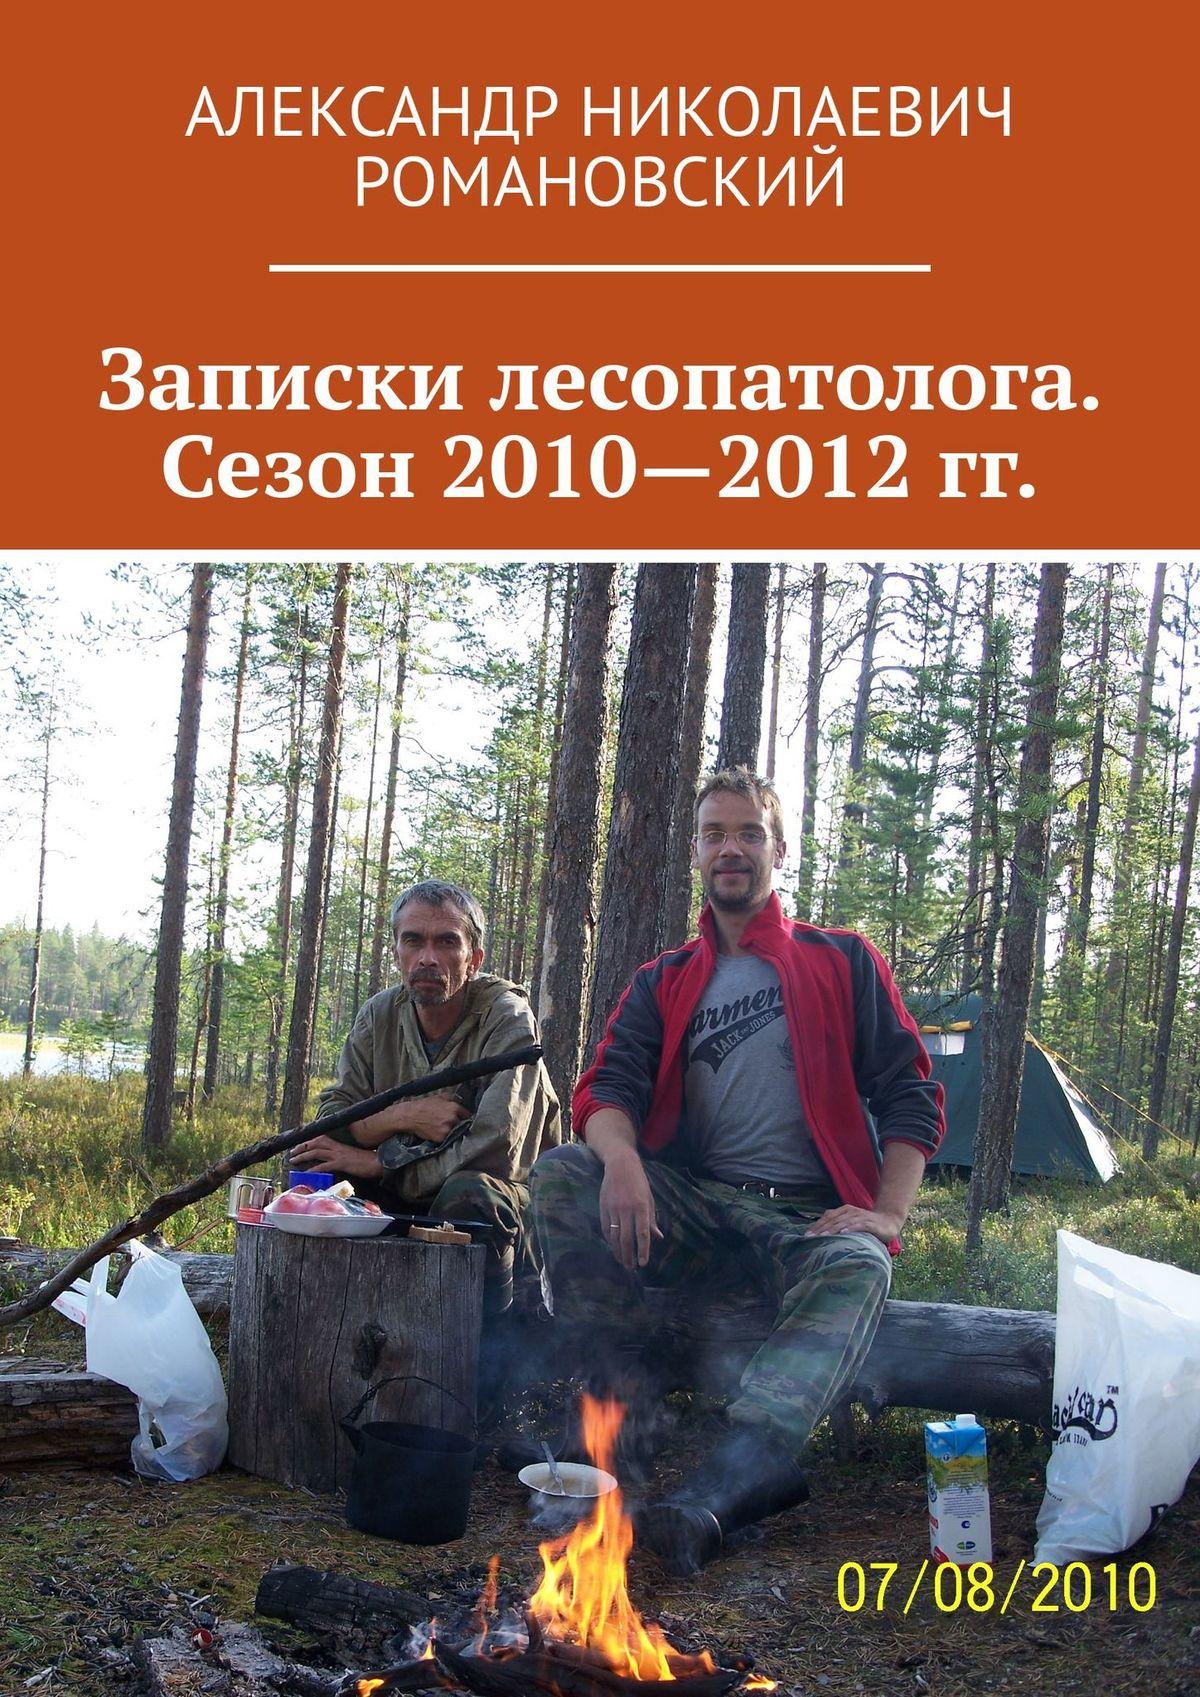 Александр Николаевич Романовский Записки лесопатолога. Сезон 2010—2012 гг.